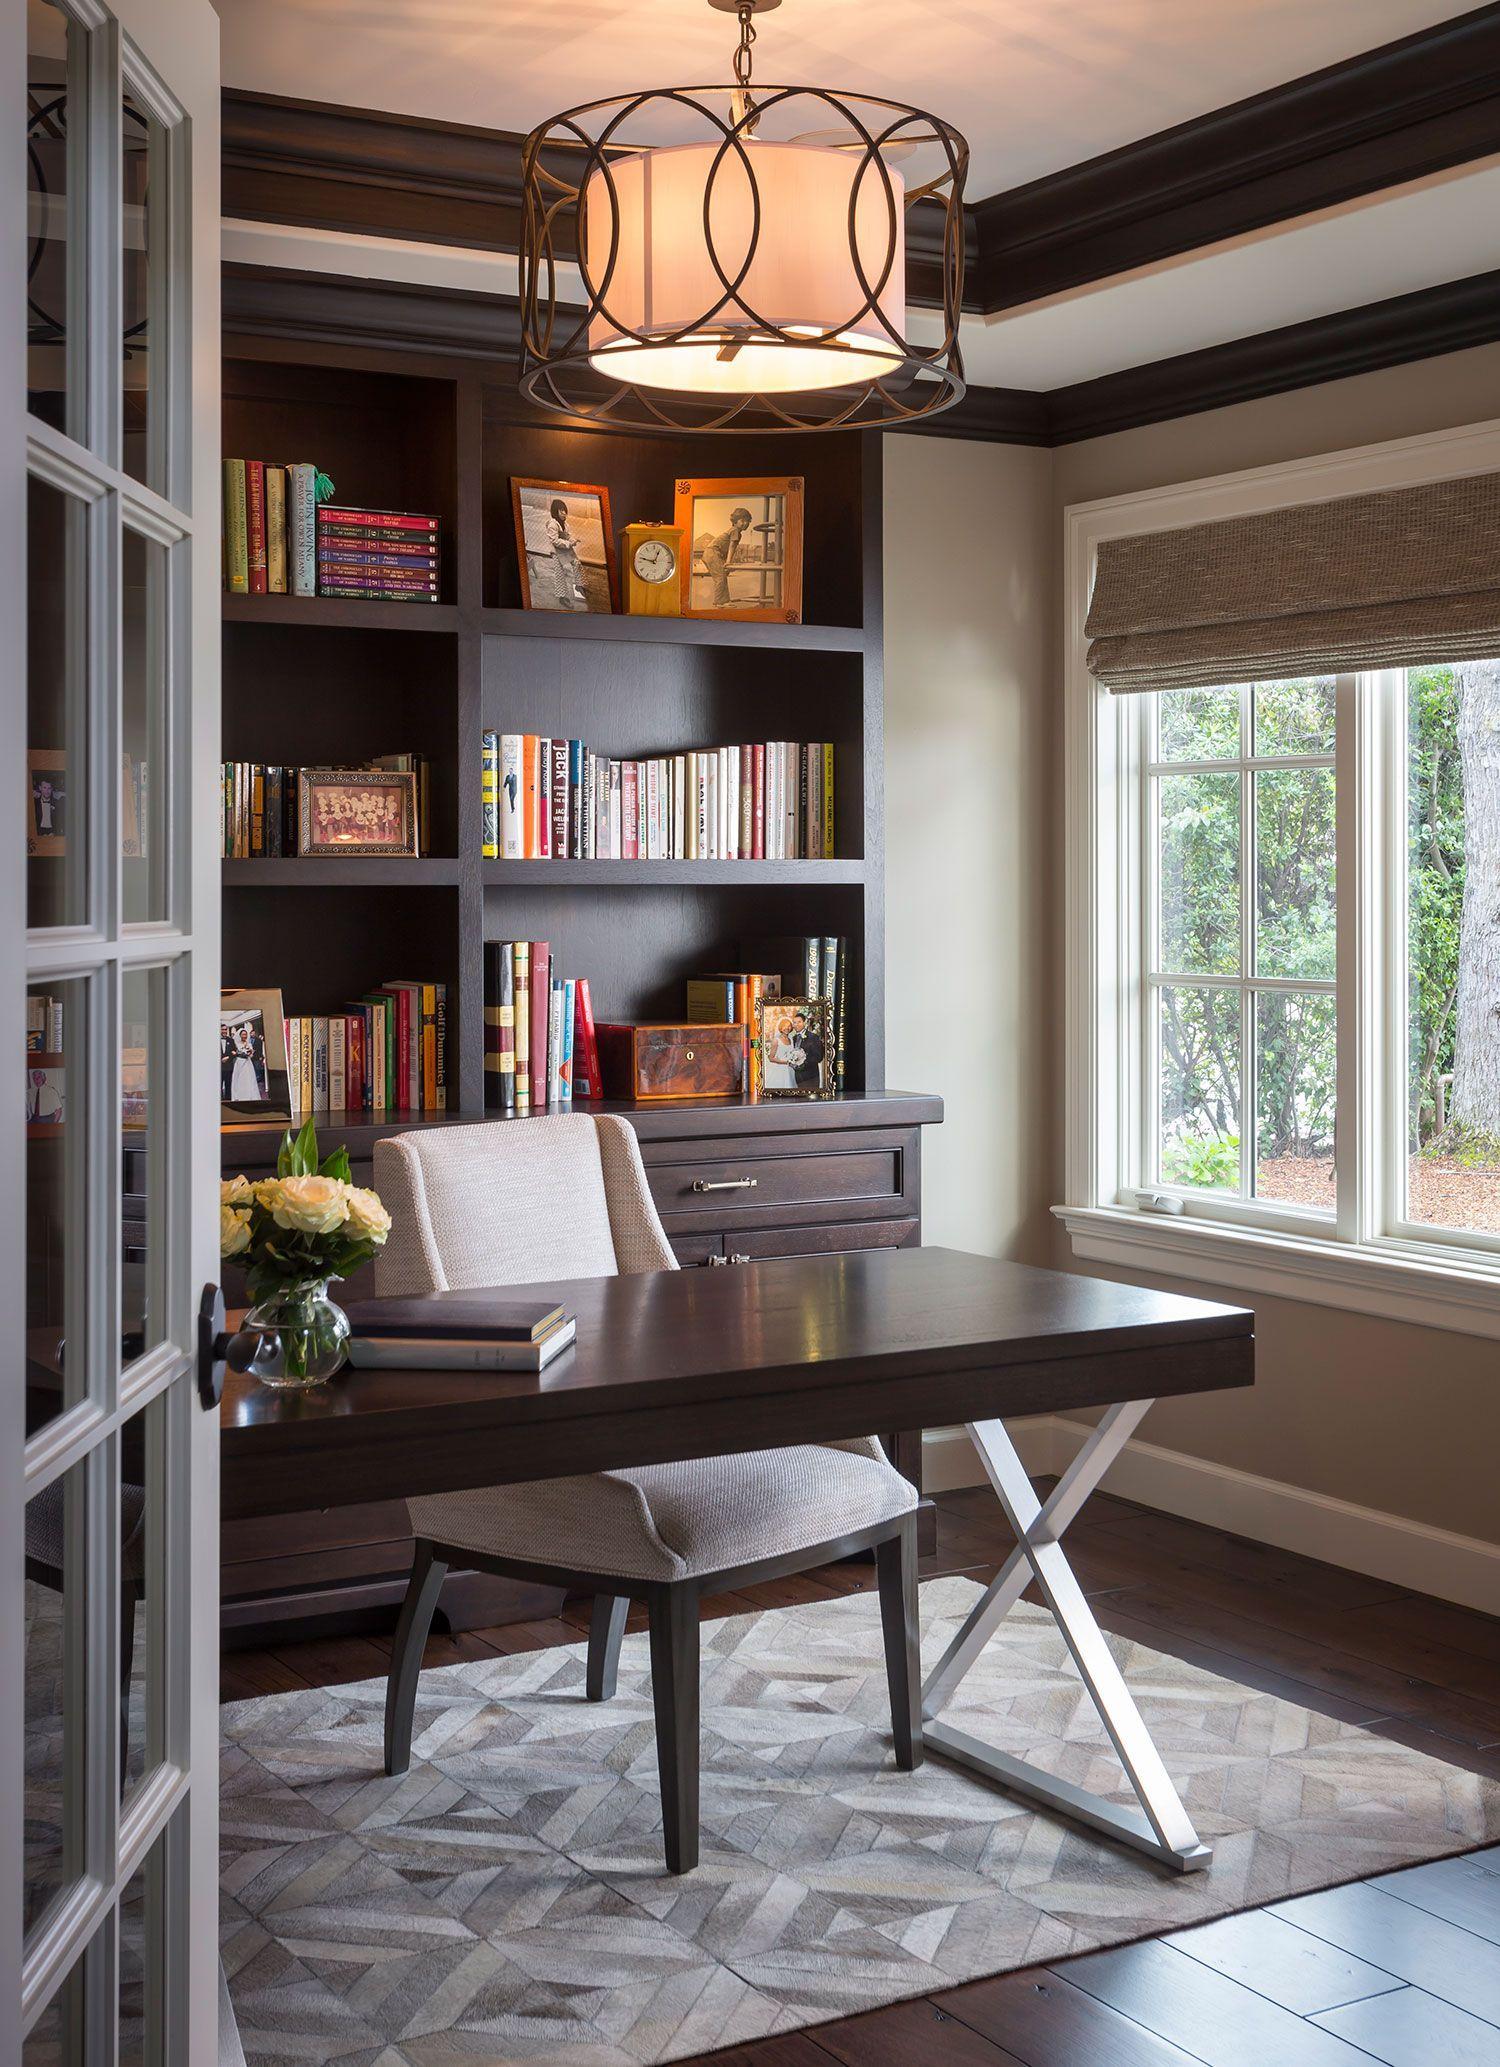 Crisp Transitional | Brownhouse Design #RaindropEssentialOilsMassage #modernfarmhousebedroom